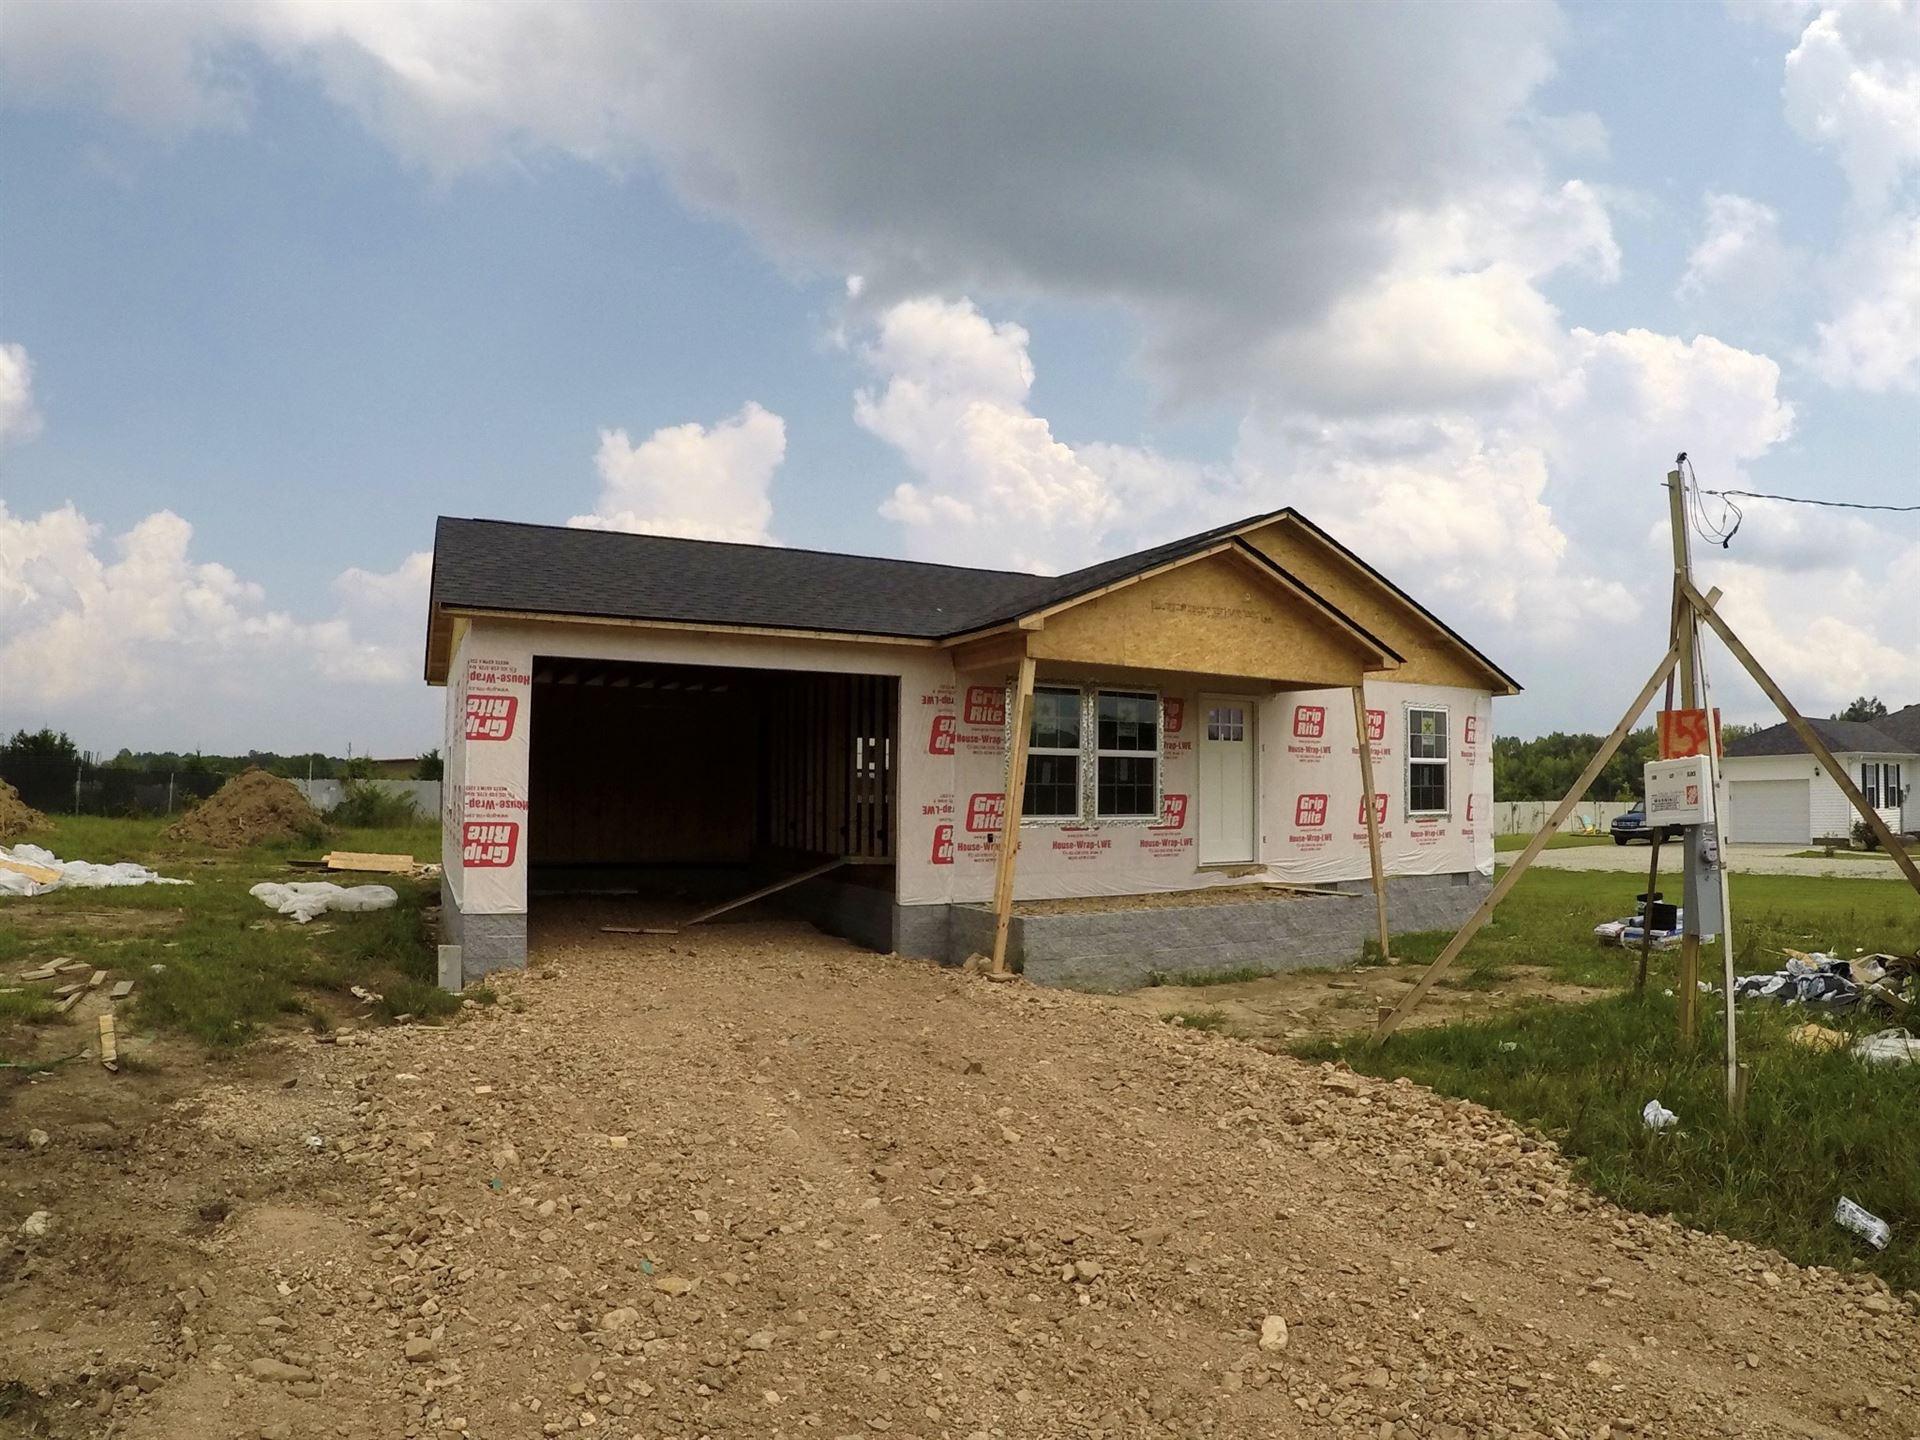 Photo of 158 Edgewood Dr, Hohenwald, TN 38462 (MLS # 2277839)